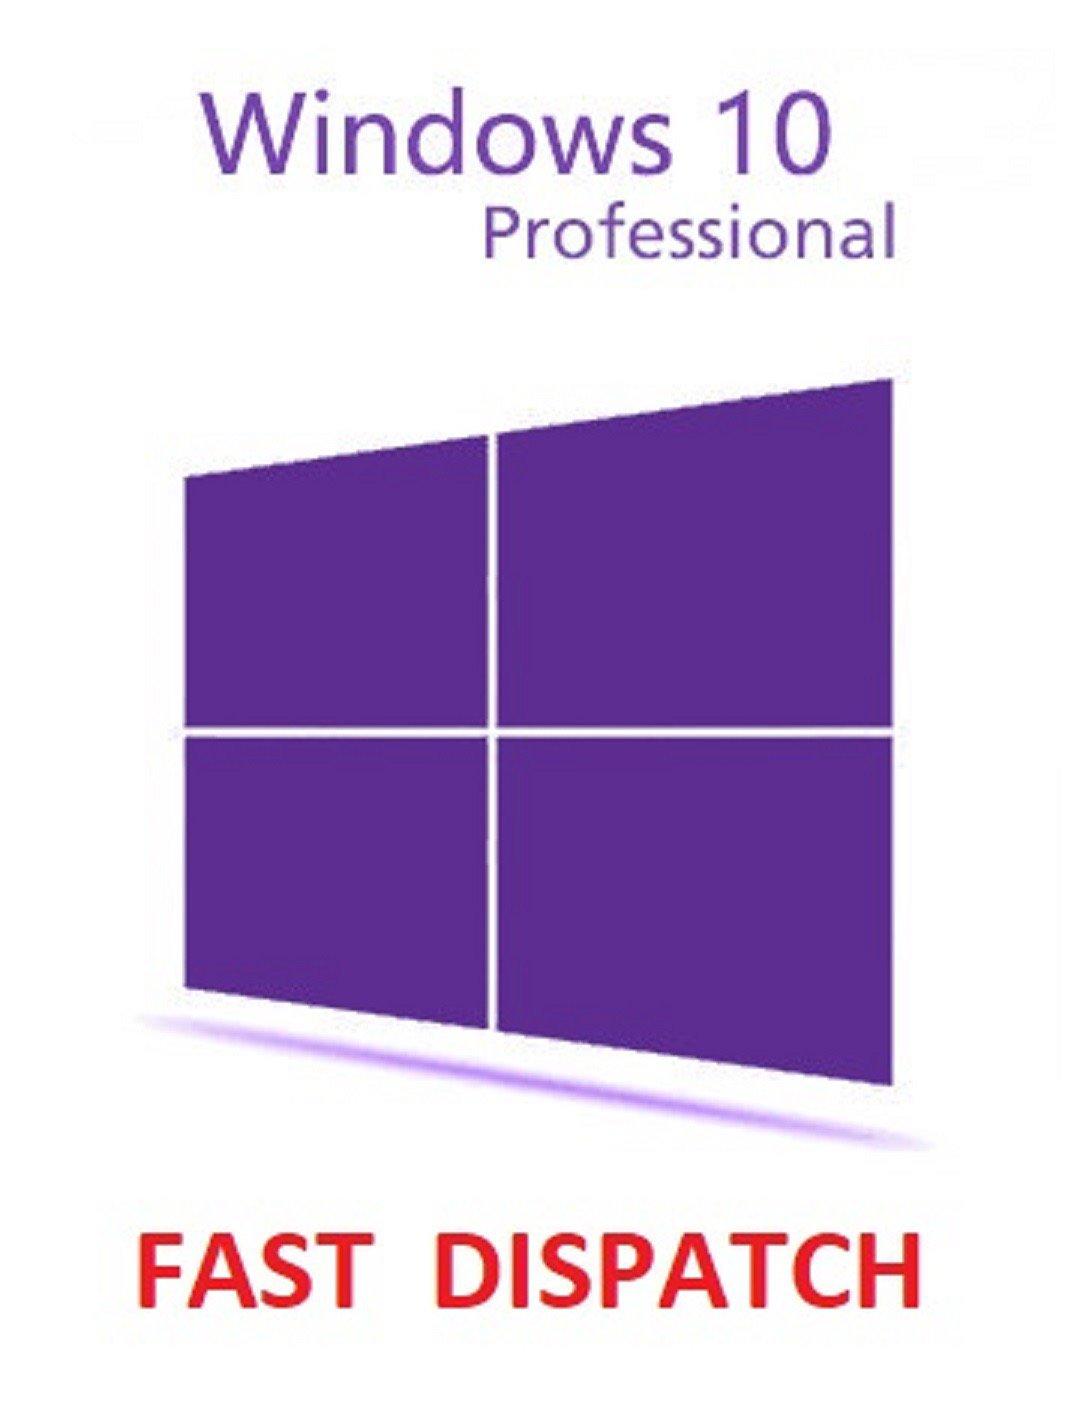 Windows 10 Pro Professional 32/64 bit Genuine License Key Product Code